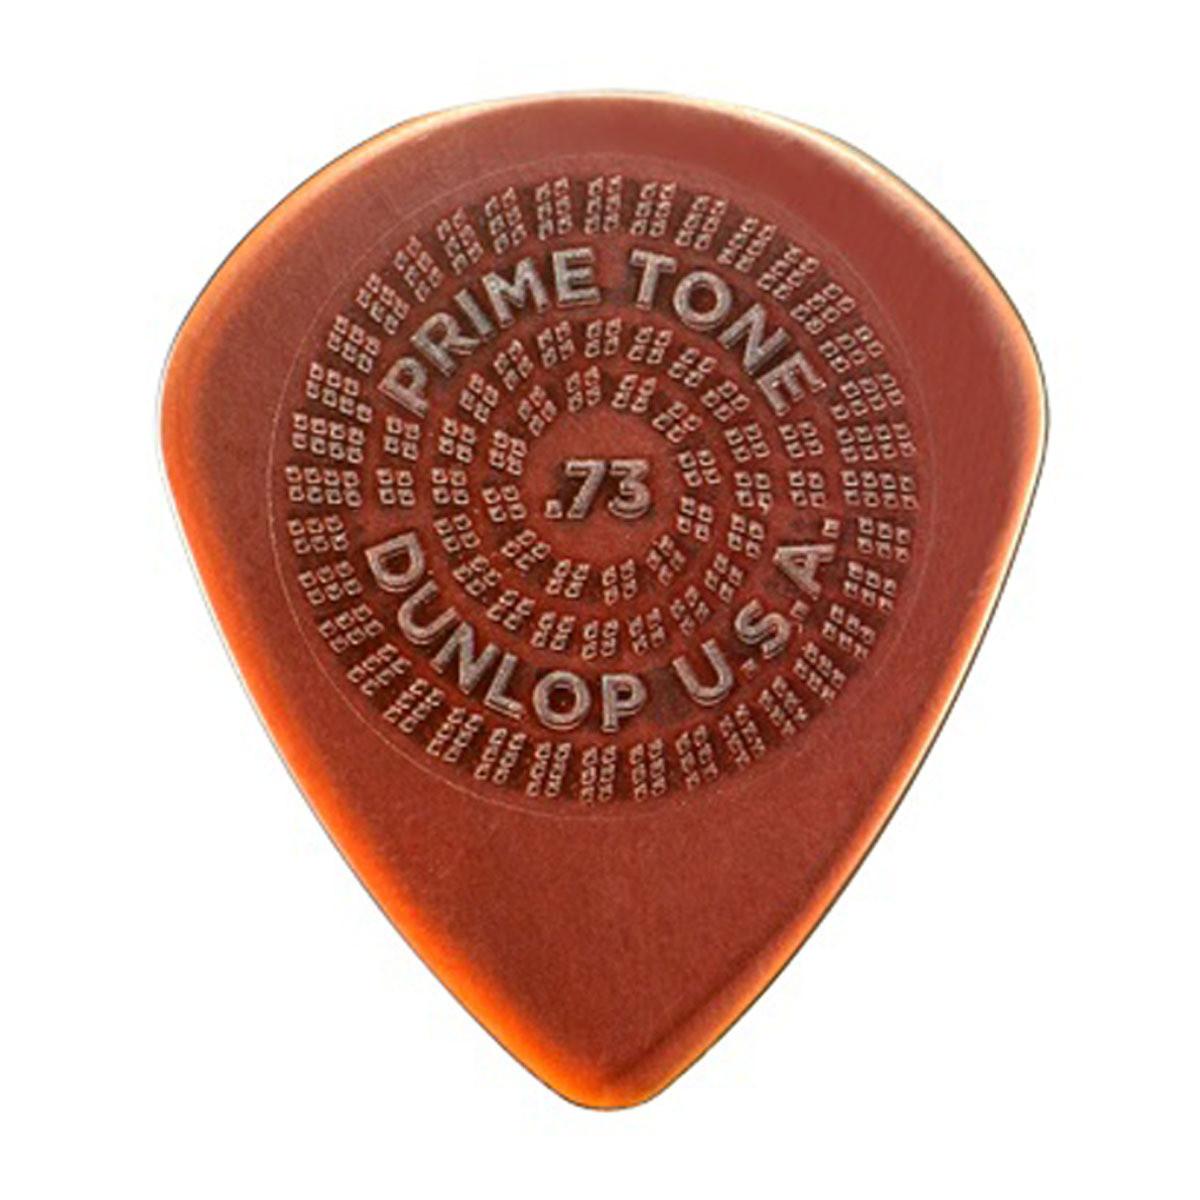 Image of Dunlop Primetone Jazz iii Xl .73mm Player Pack / 3